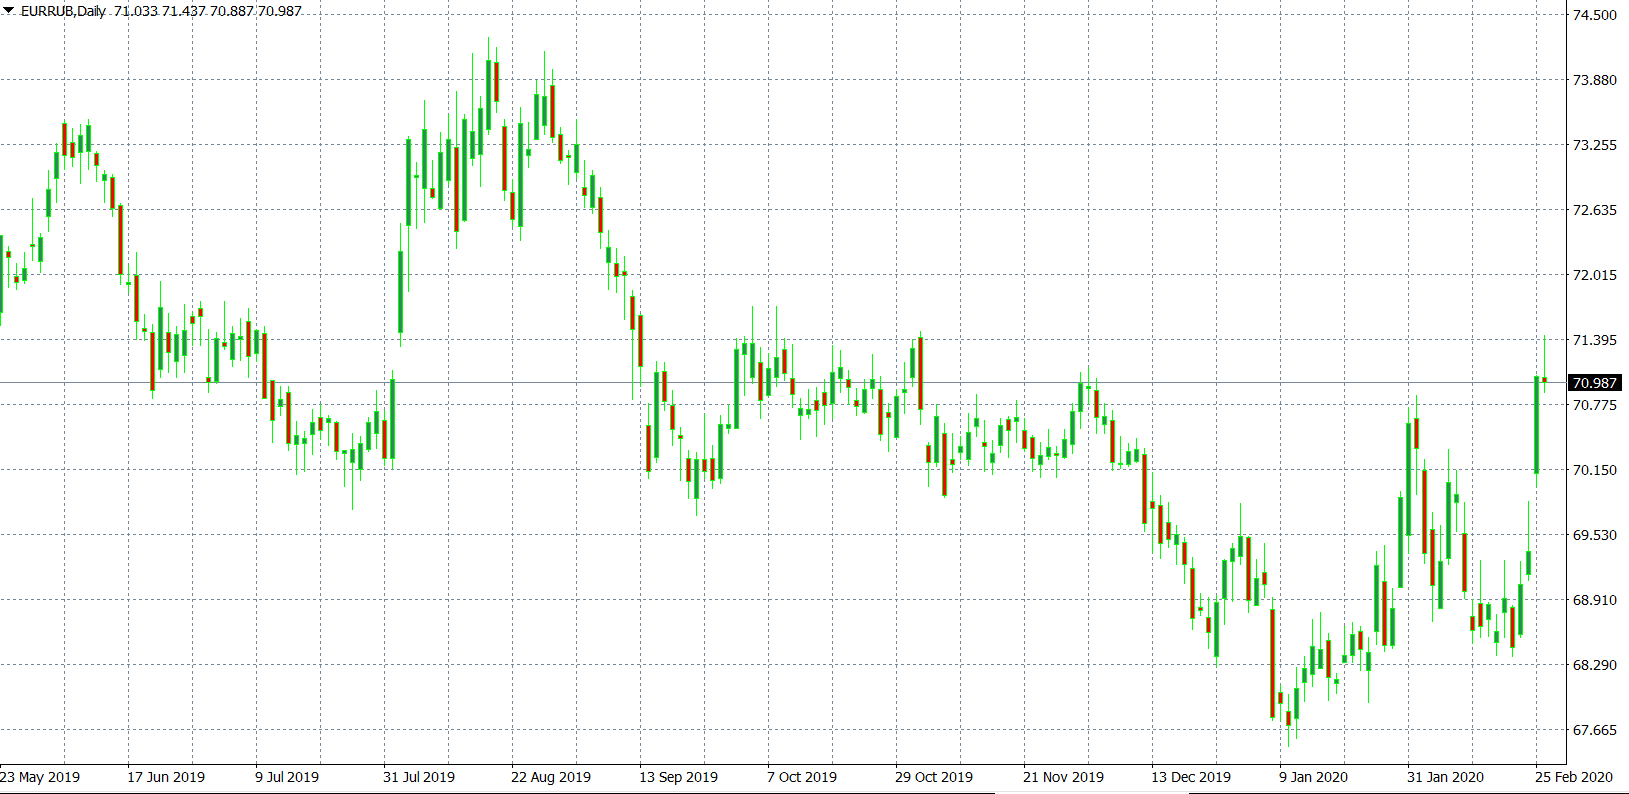 Прогноз курса евро к рублю на март 2020 года